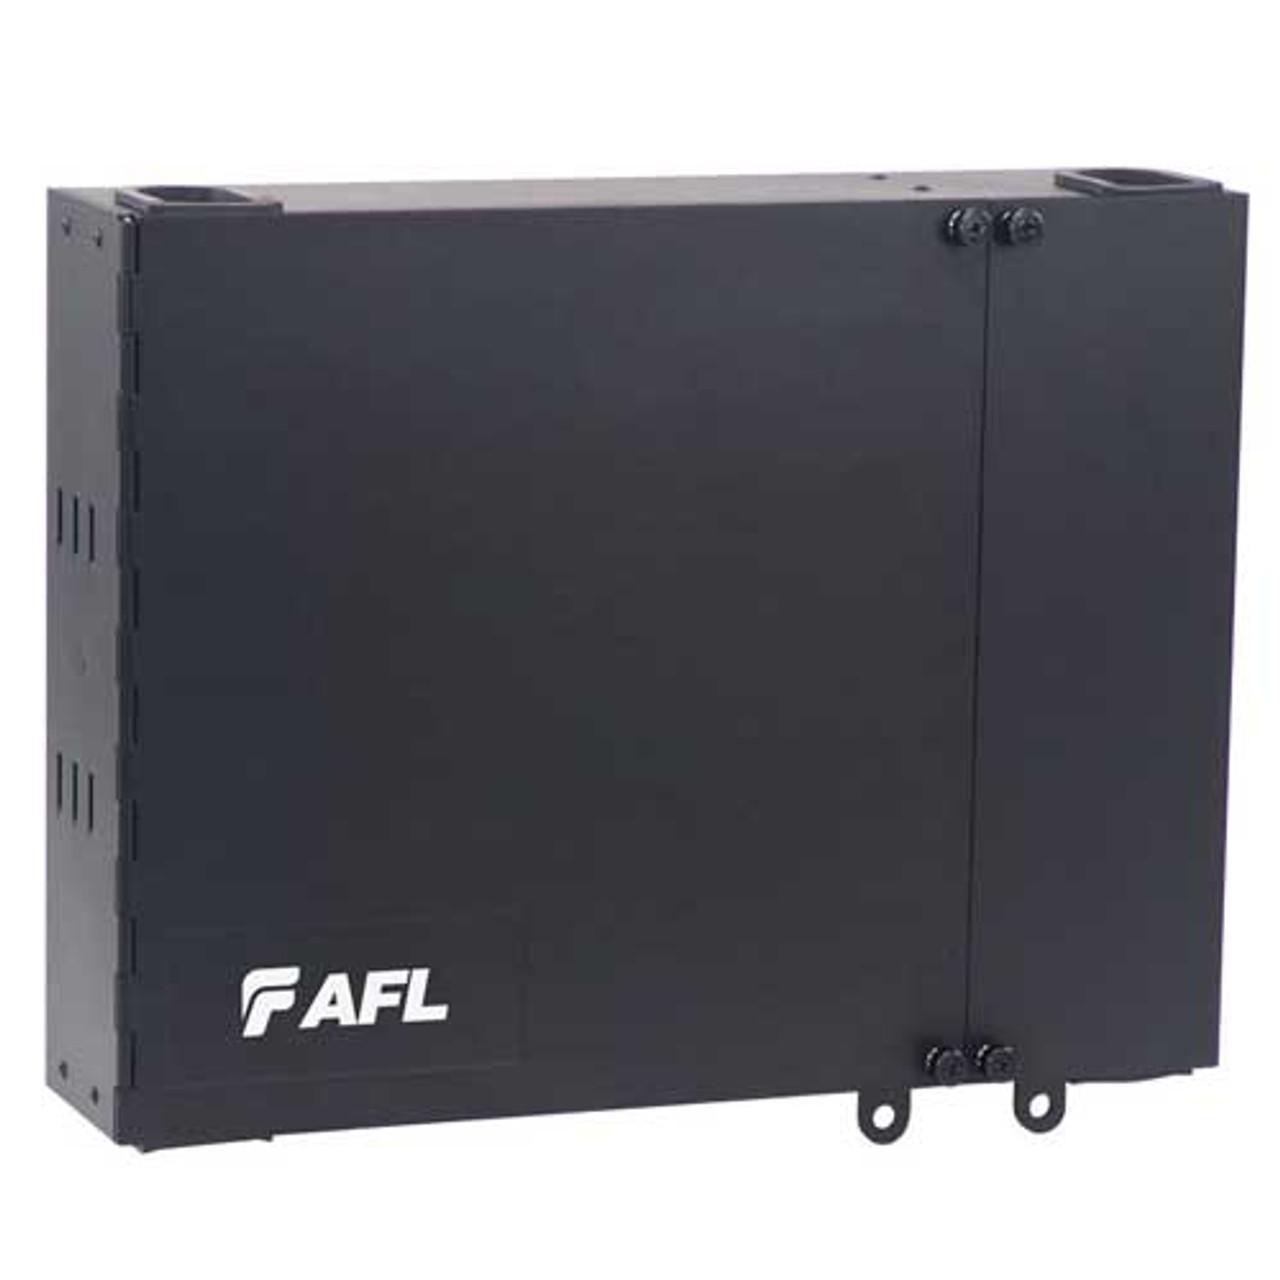 AFL 2 Slot Wall Mount - WME02